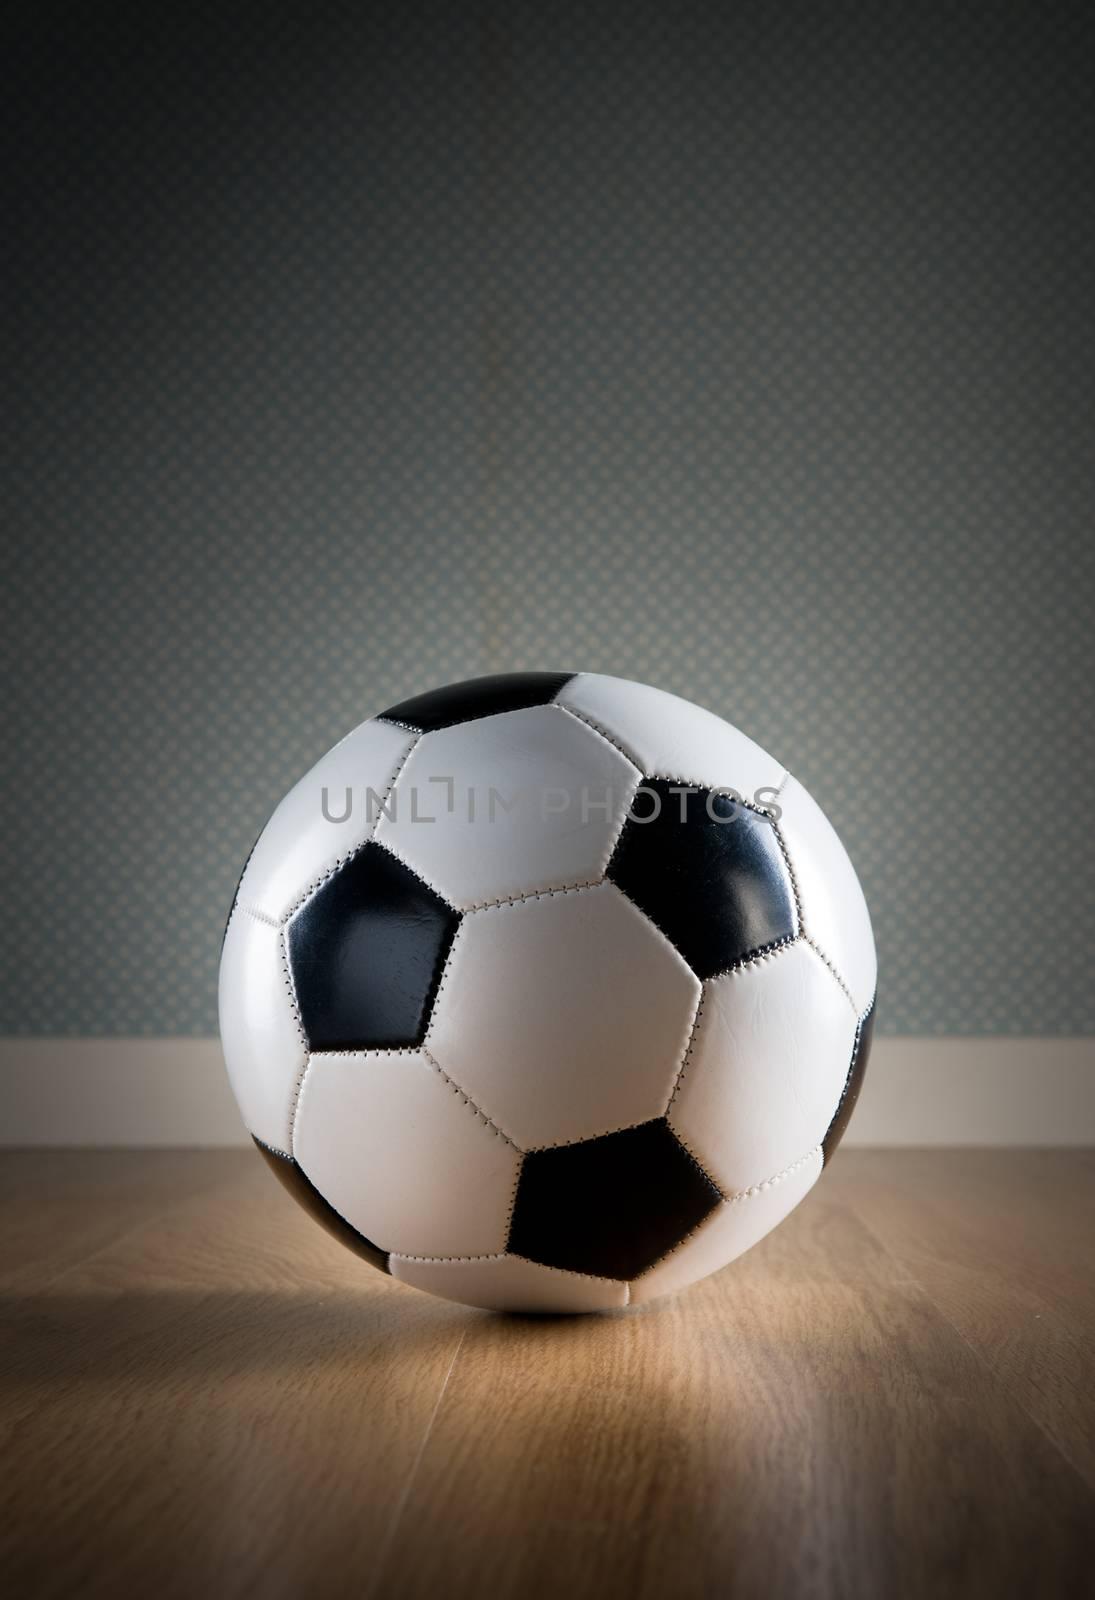 Soccer ball on hardwood floor and vintage wallpaper on background.